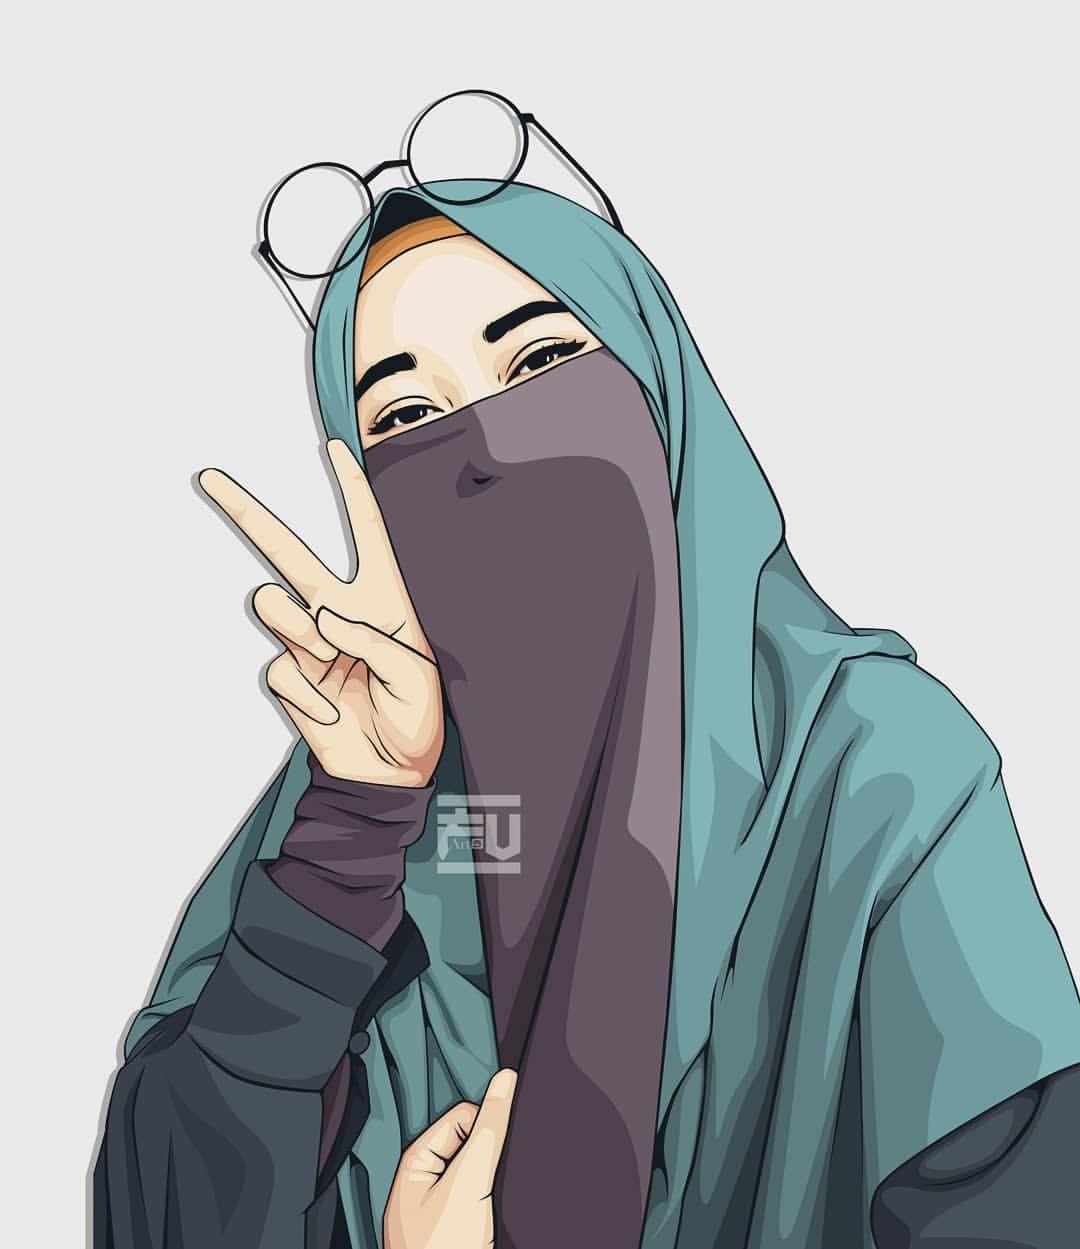 Aesthetic Hijab Girl Anime Wallpapers - Wallpaper Cave